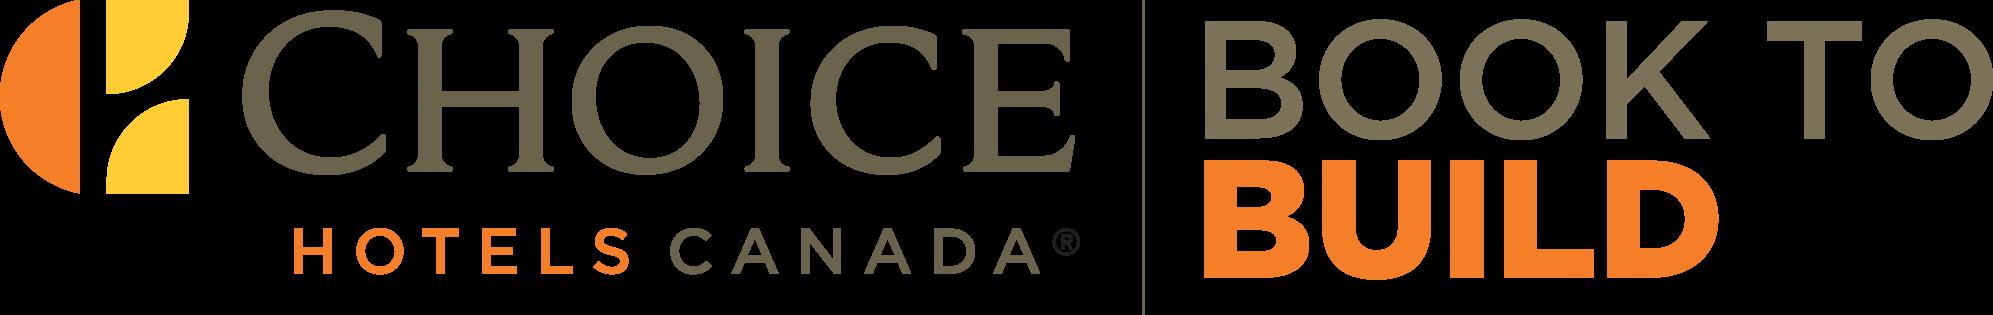 Choice Hotels Canada